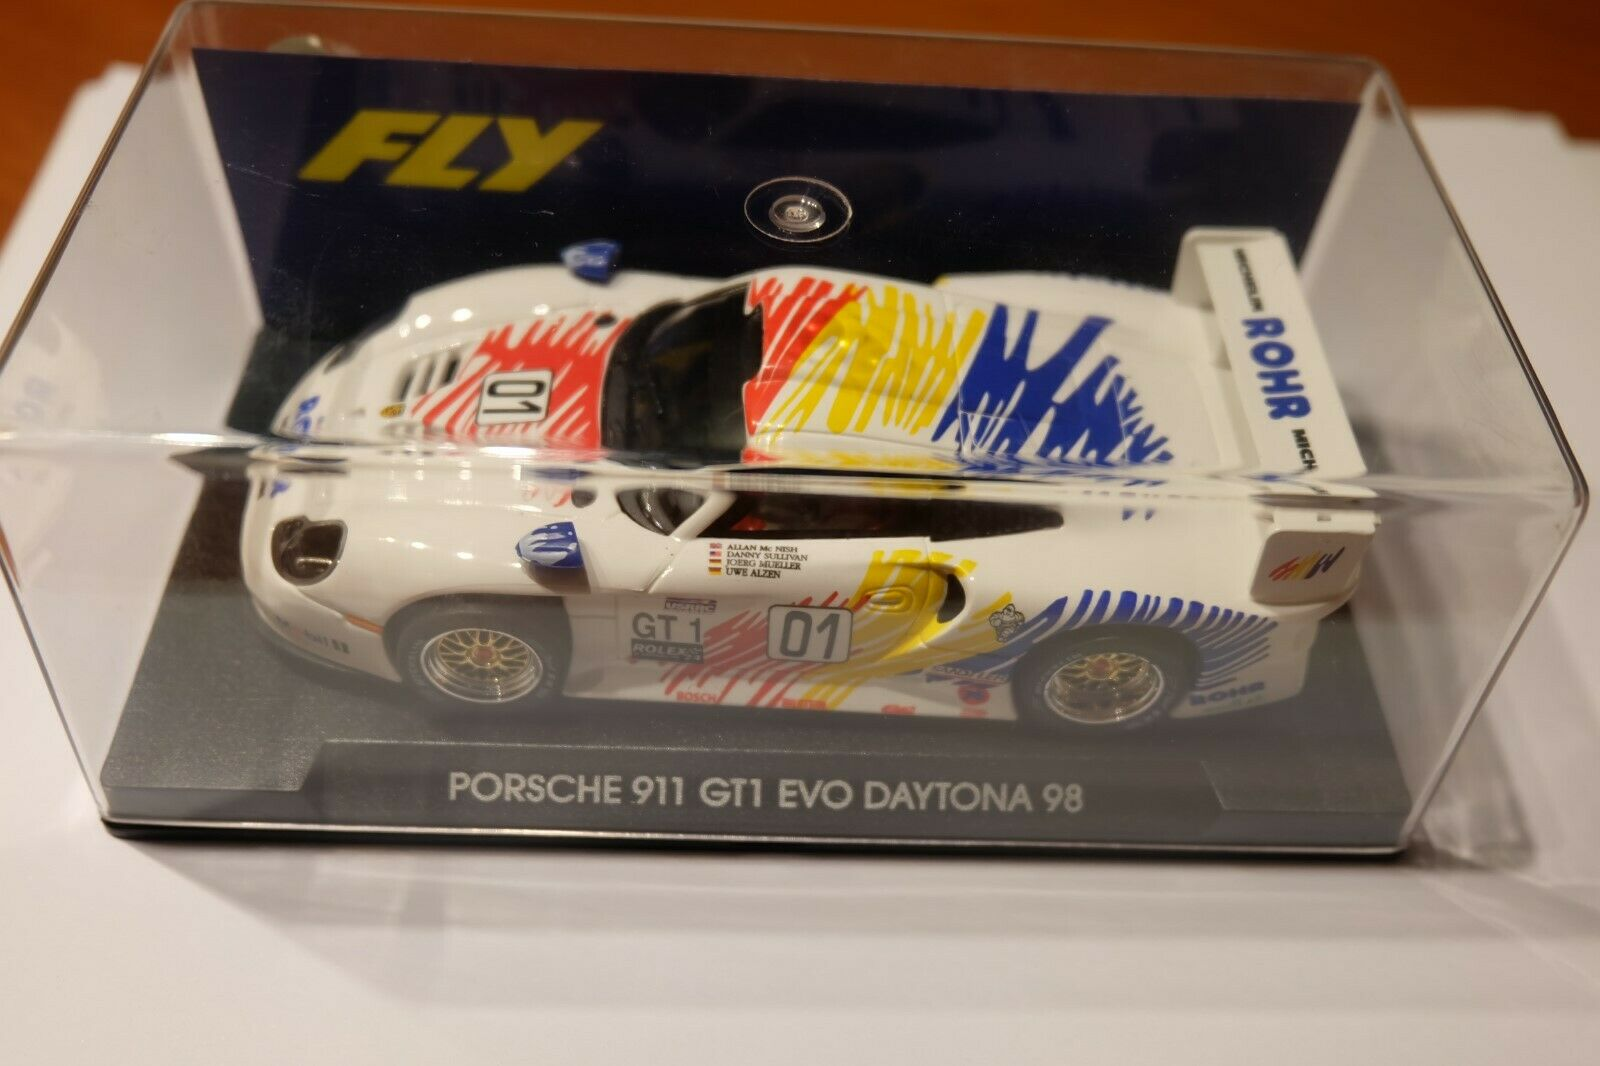 PORSCHE 911 GT1 EVO  Daytona 98  Weiß FLY A52